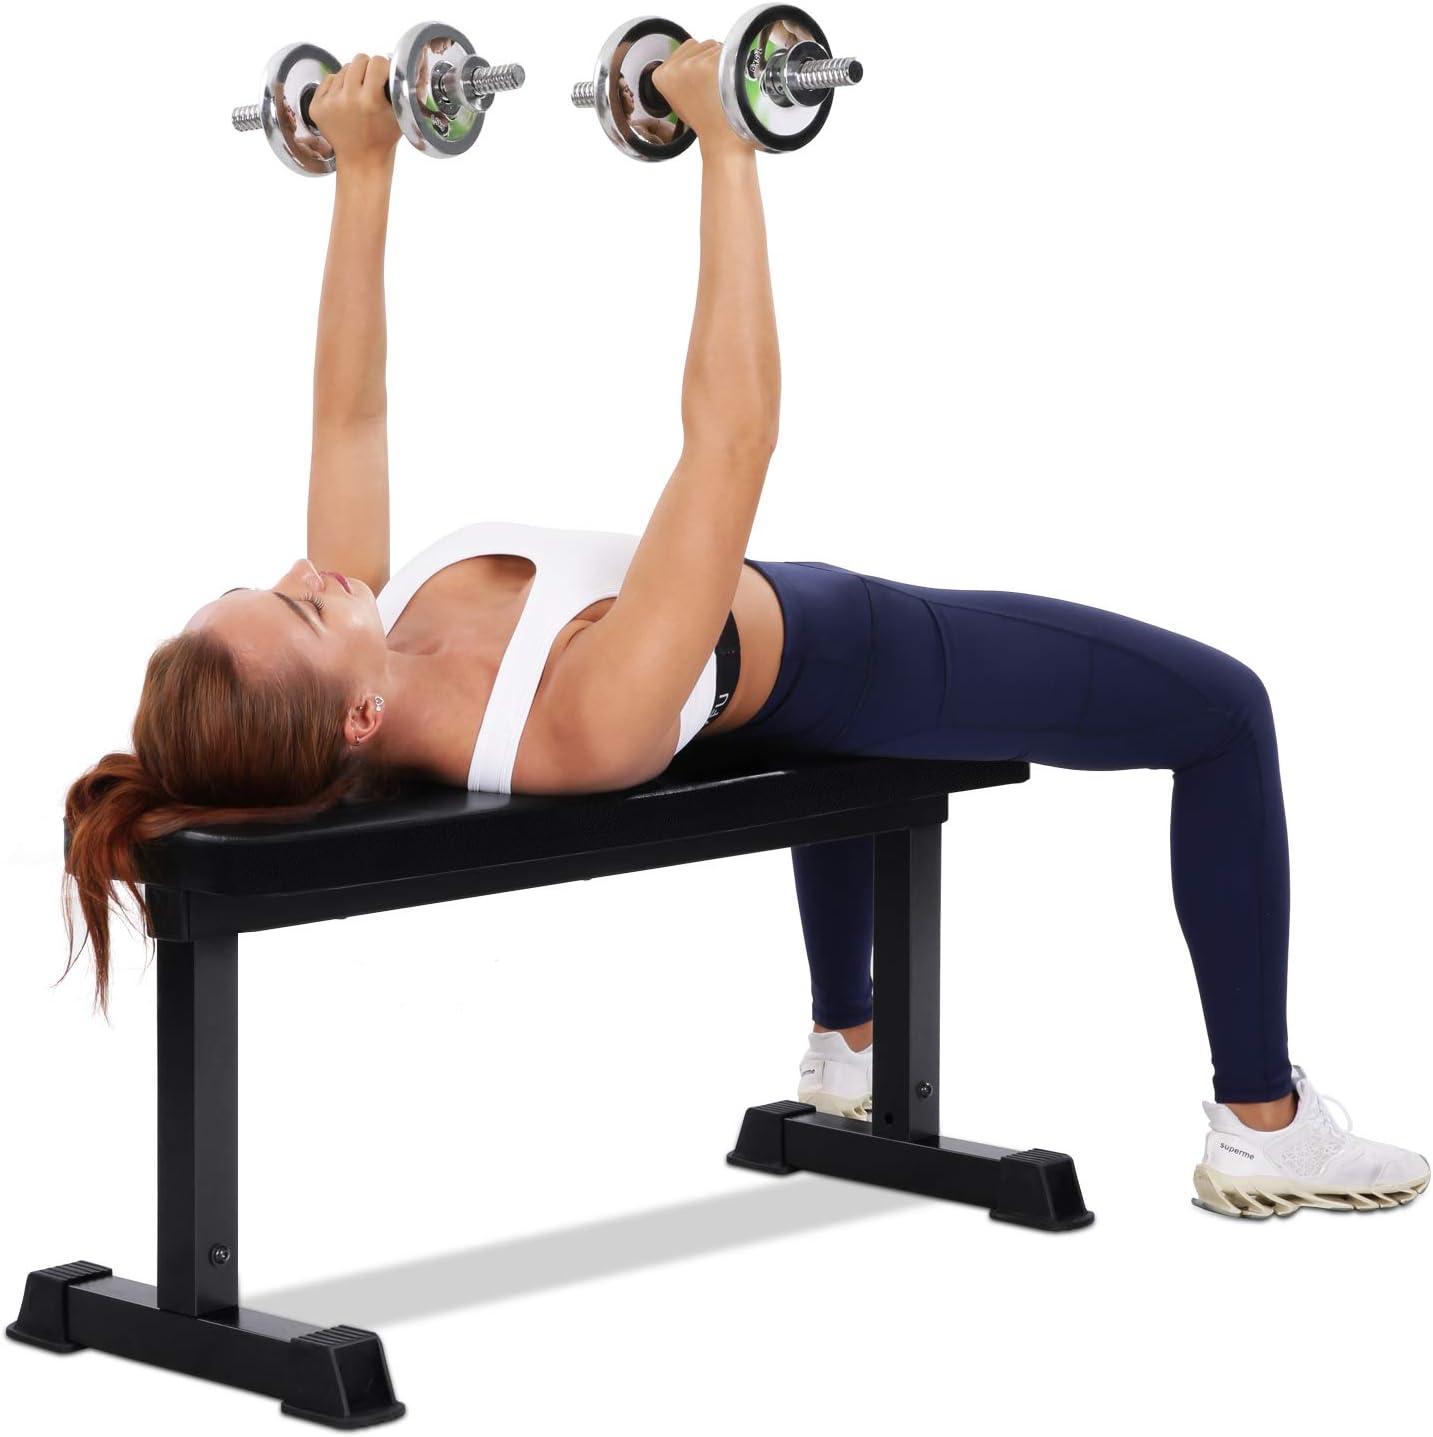 MaxKare Flat Weight Bench